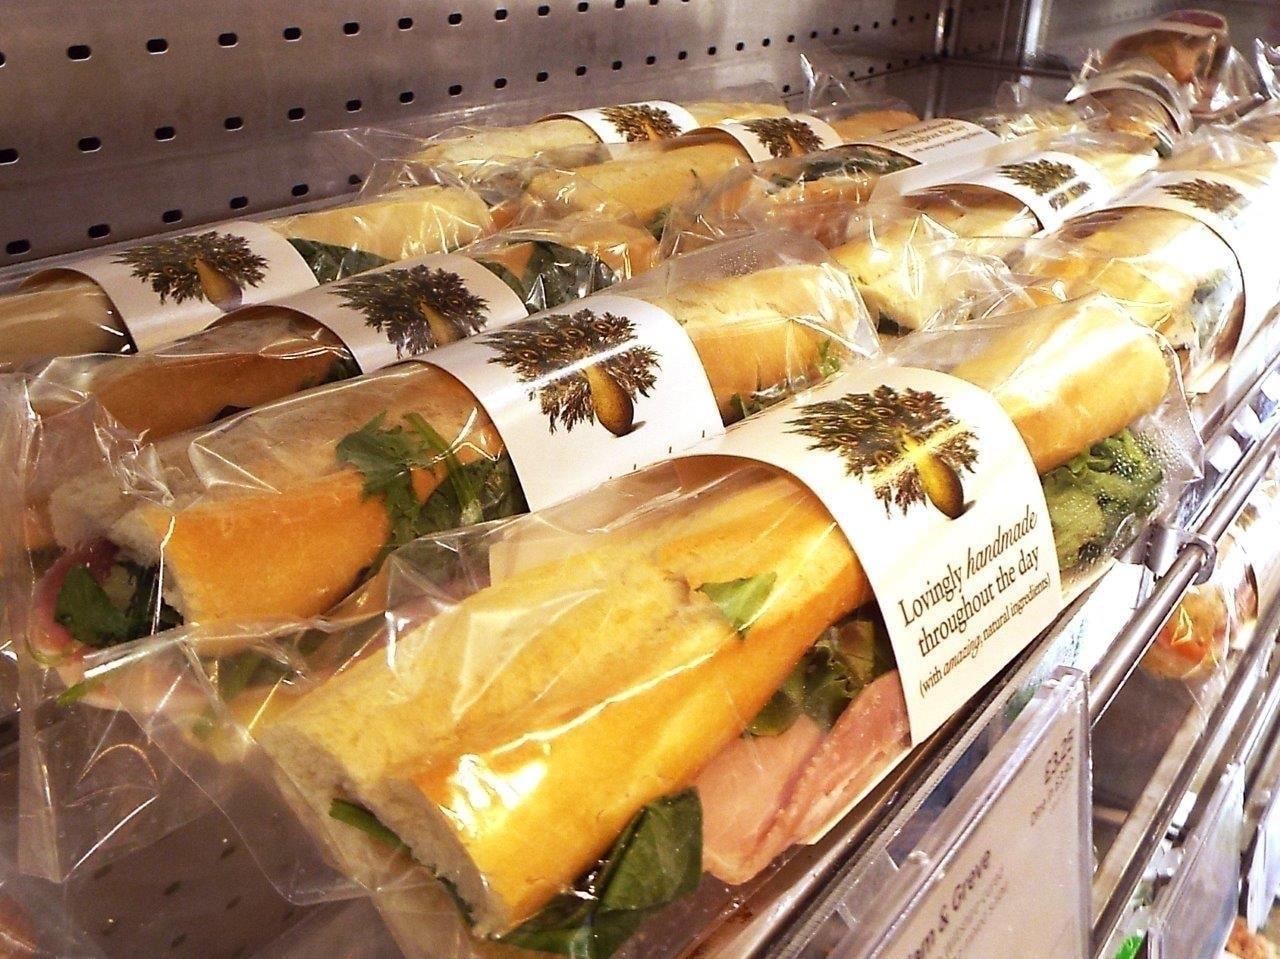 Pret baguettes and wraps